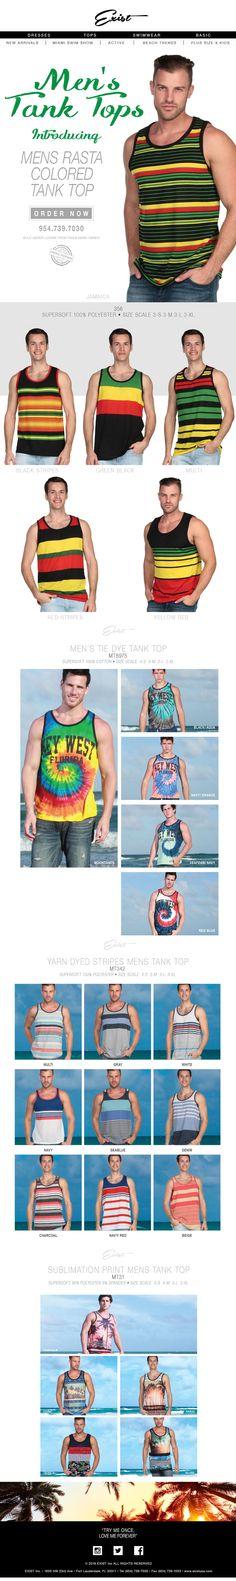 The New Men's Tank Tops! Hottest Deals! Best Prices! #menstanktops #existUSA #TANKTOPS #Tshirts #menswear